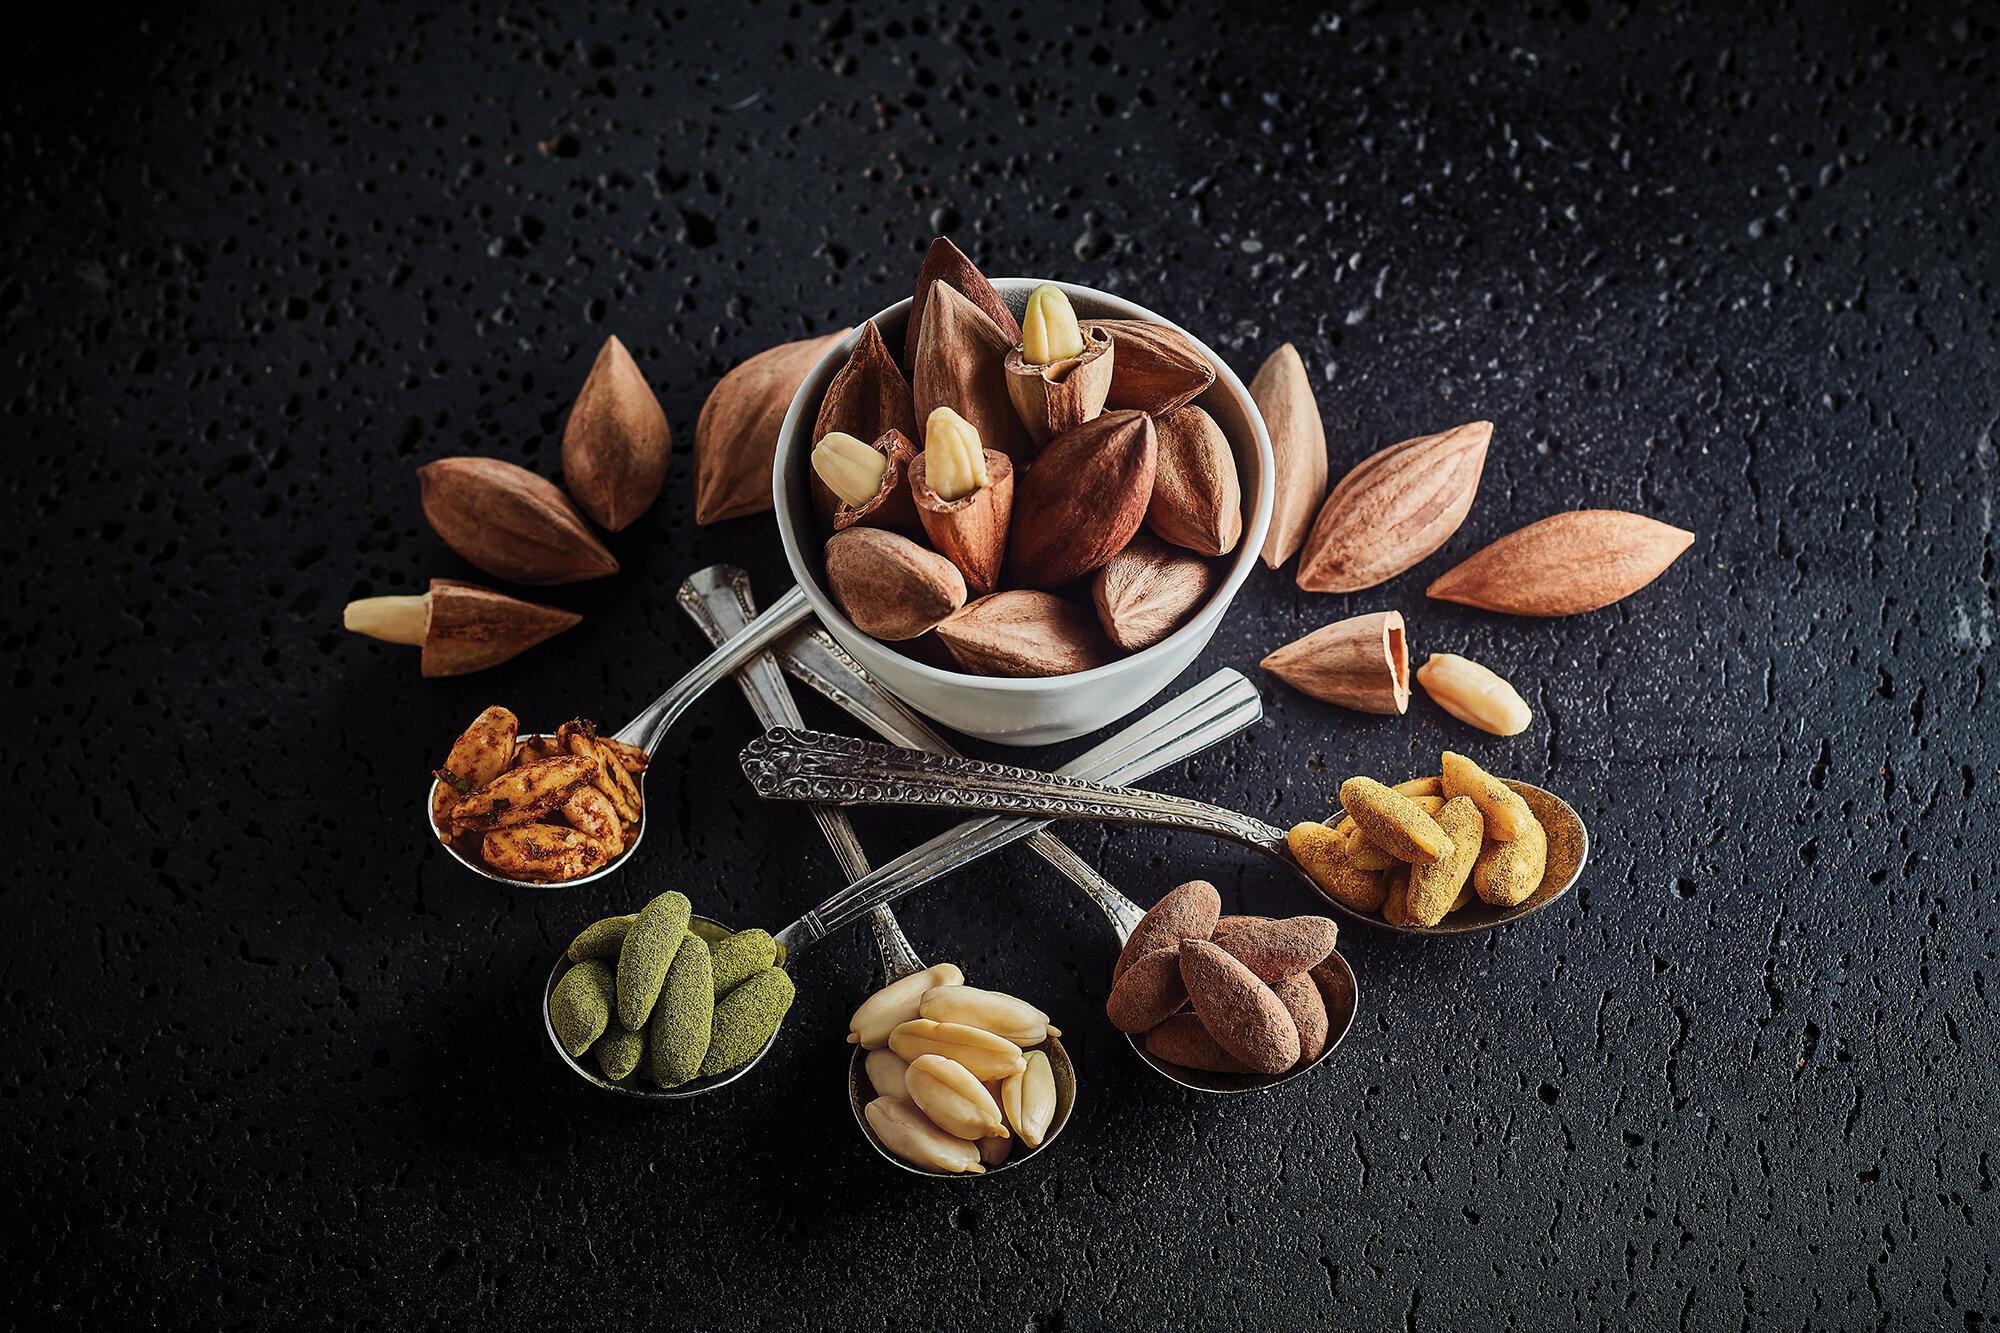 Mount Mayon Premium Pili Nuts pili product range